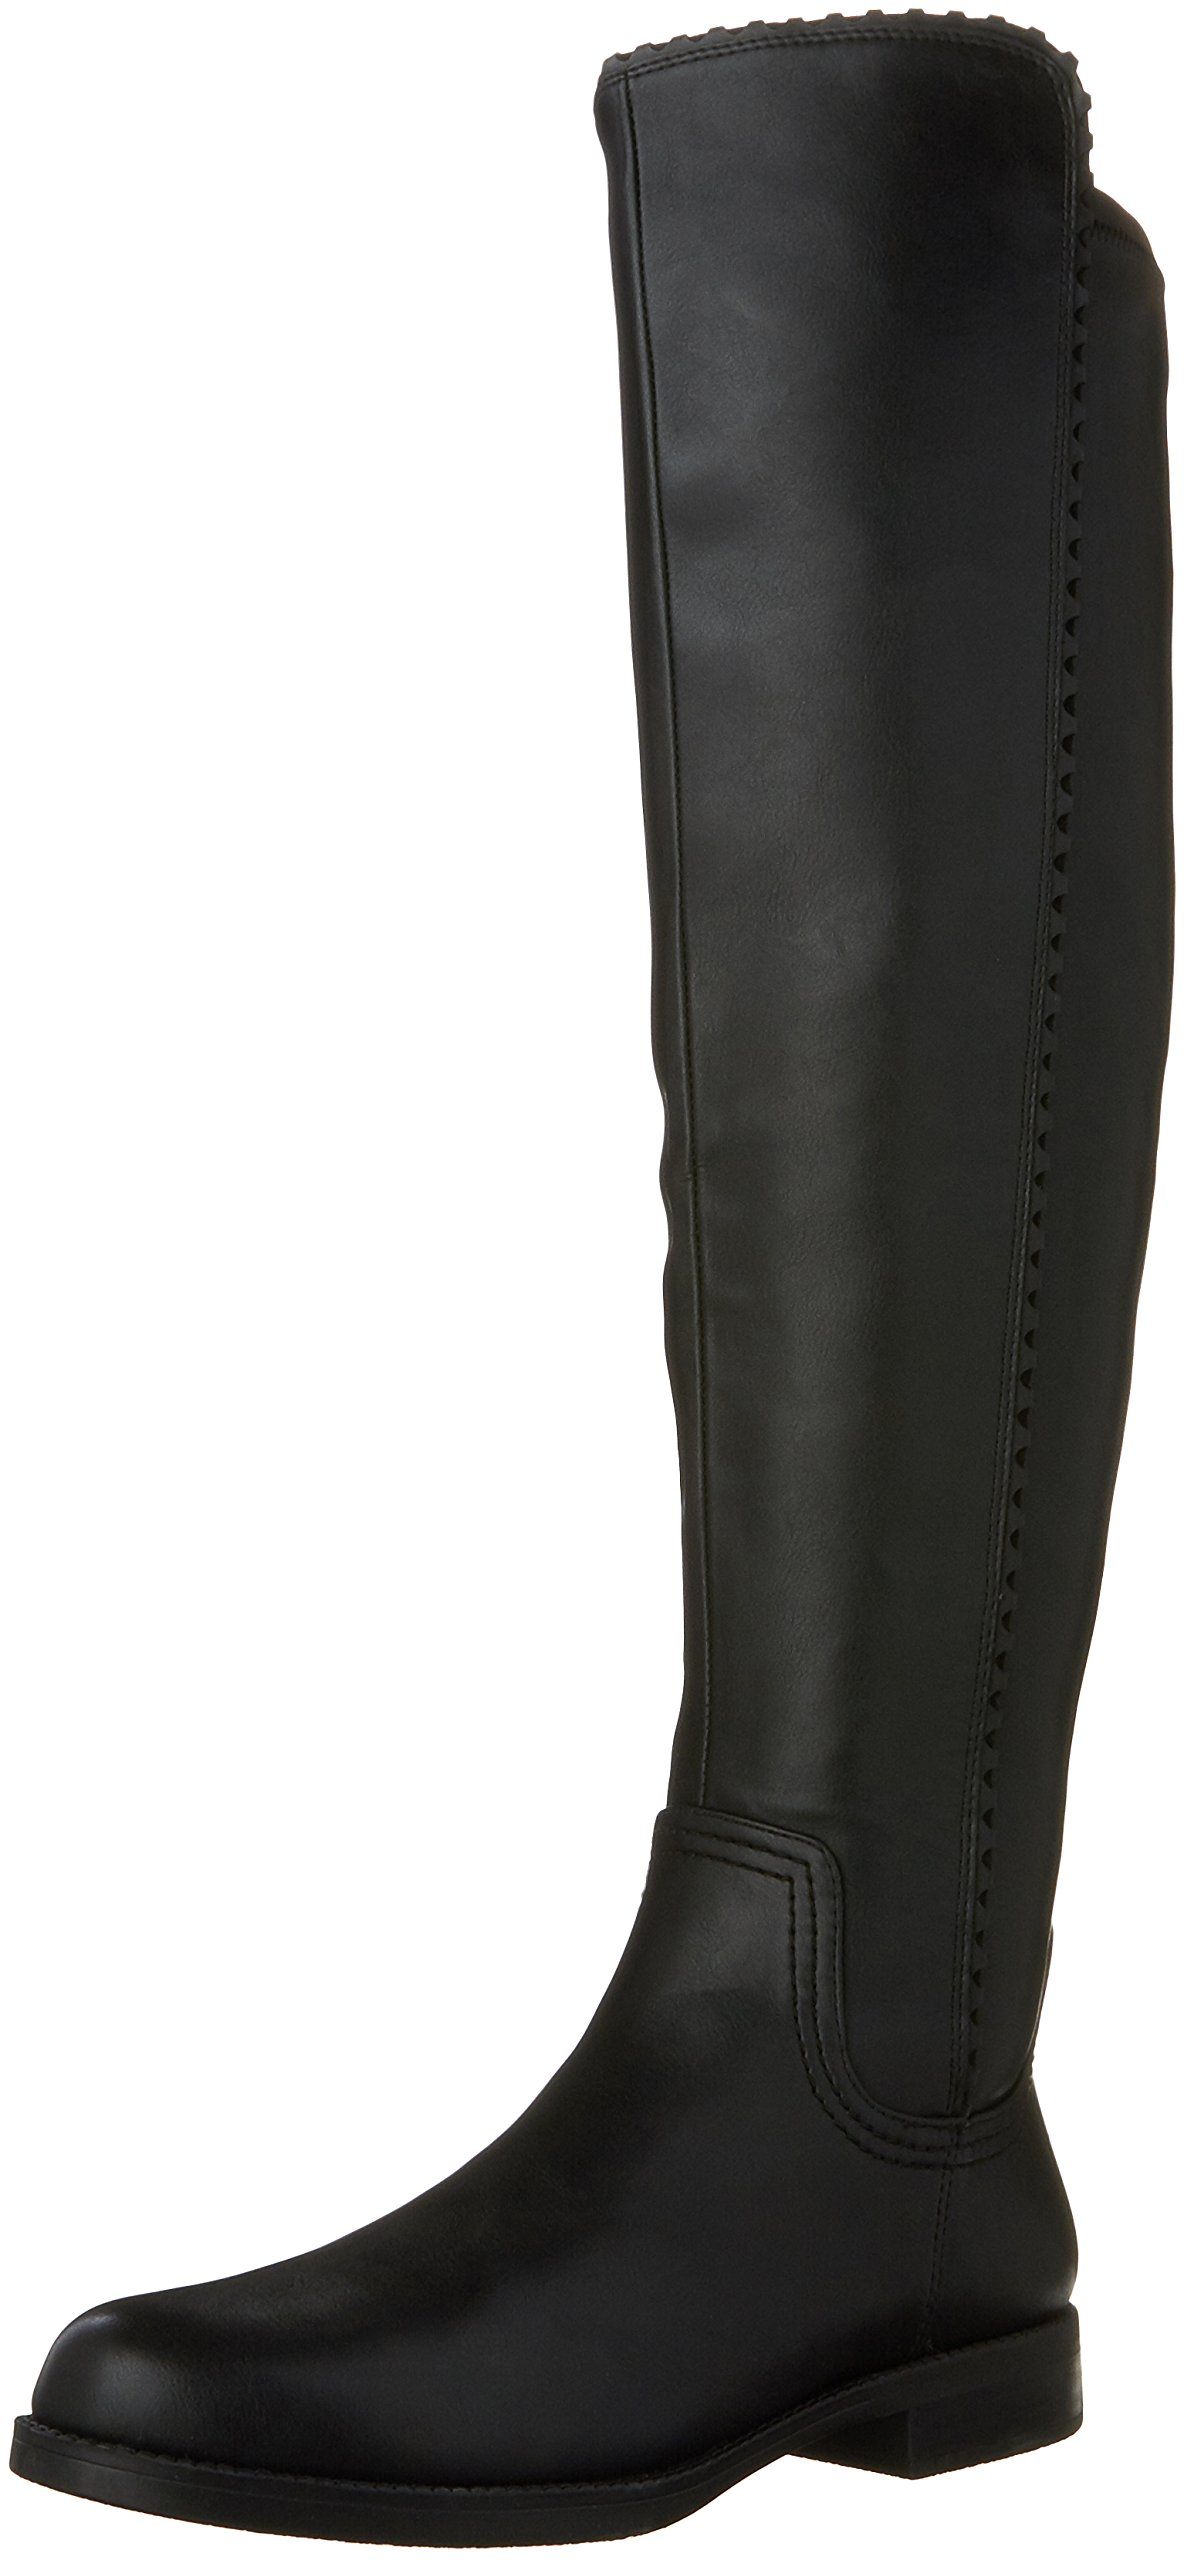 Franco Sarto Women's Charlotte Over The Knee Riding Boot (8 B(M) US, Black)